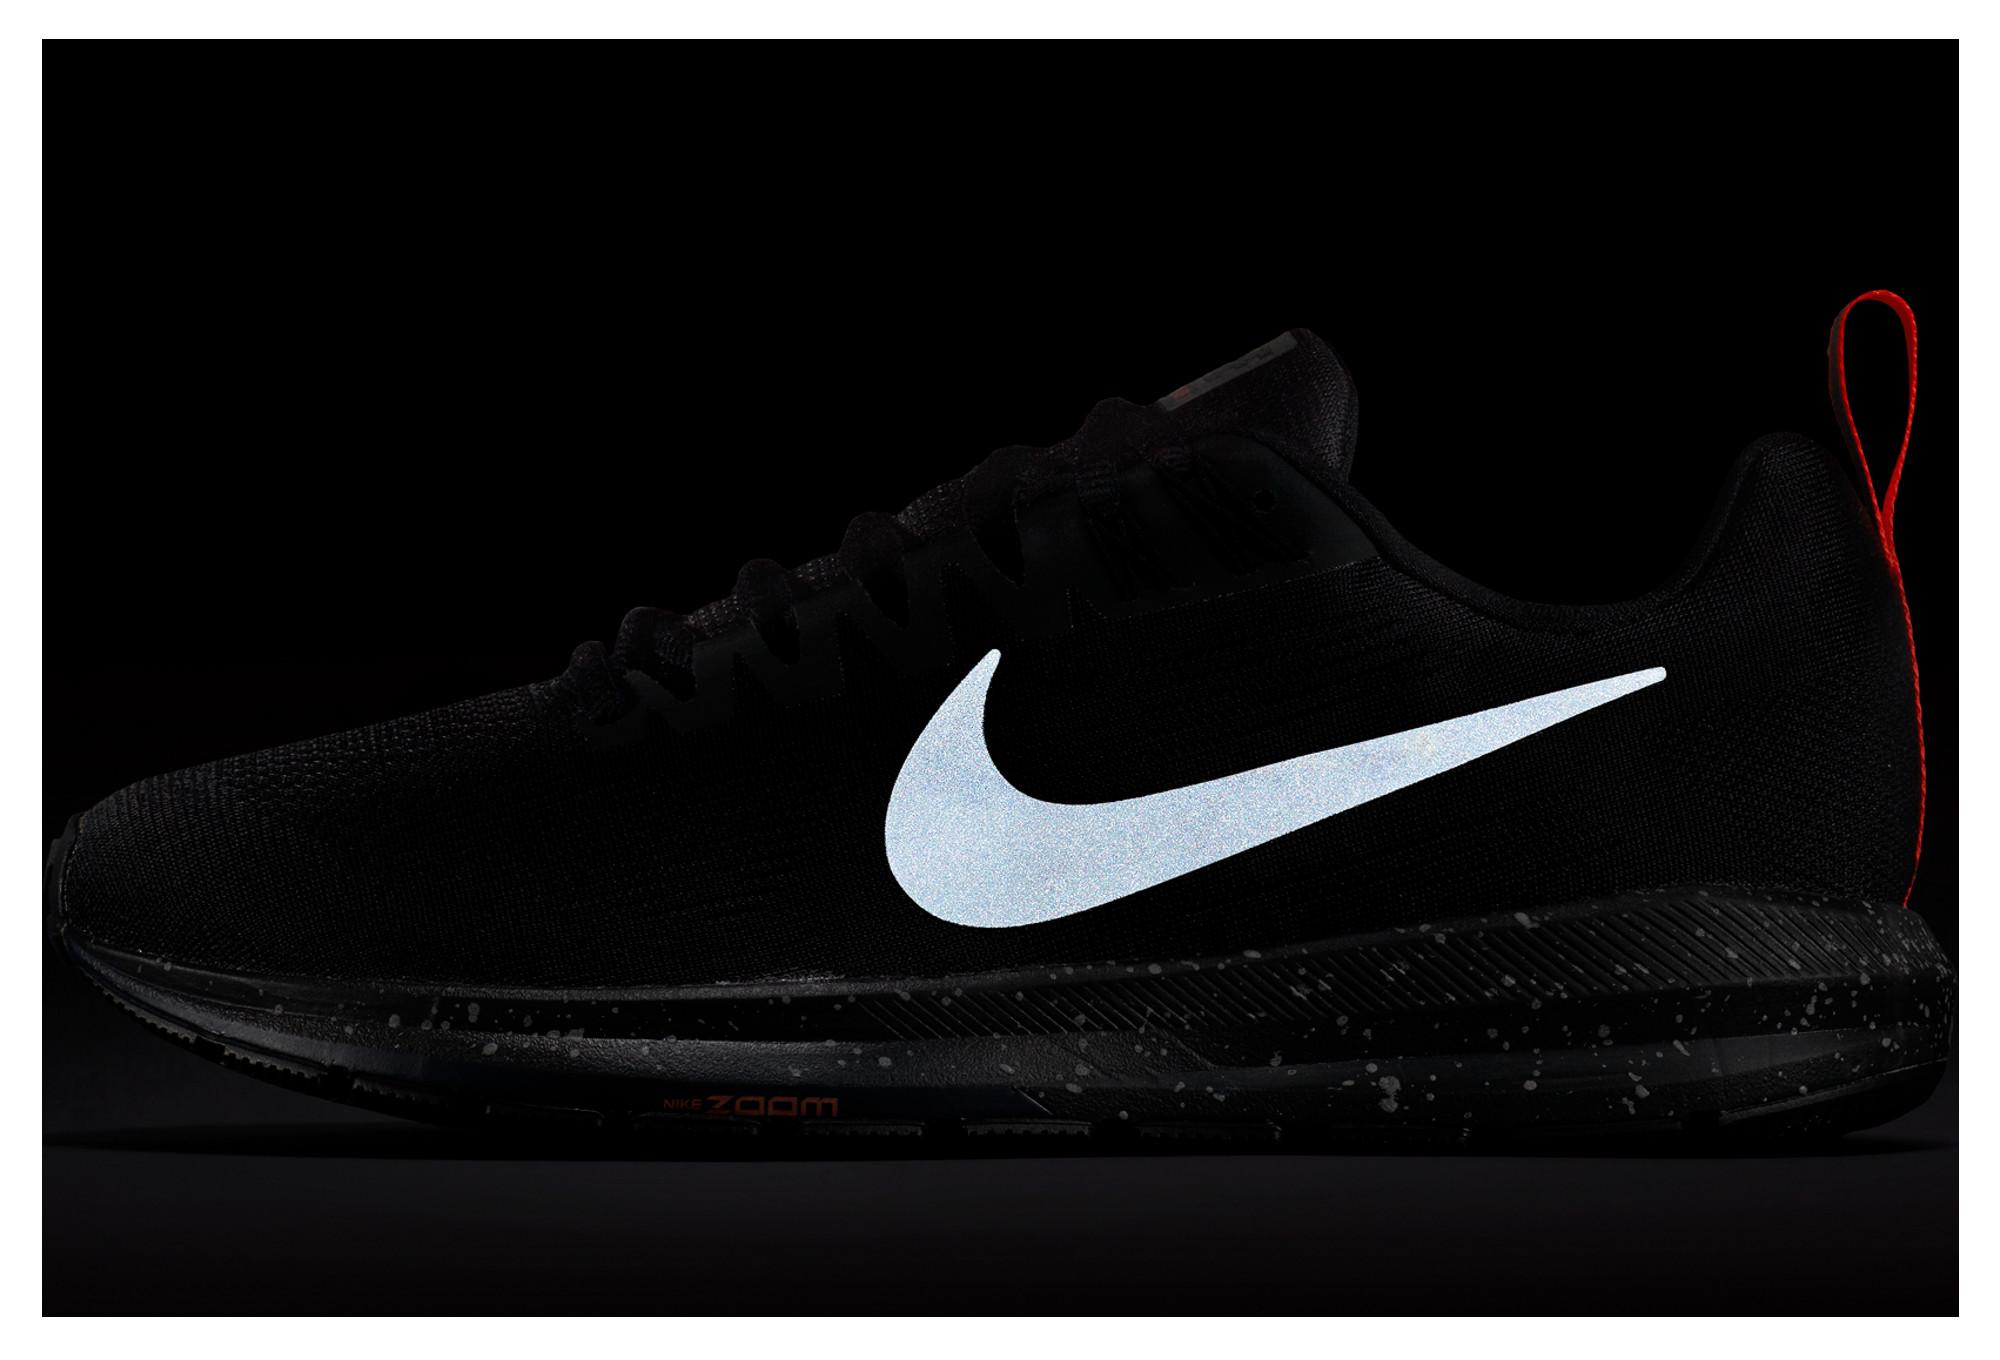 8943cb014ac Zapatillas de mujer Nike Air Zoom Structure 21 Shield negras ...